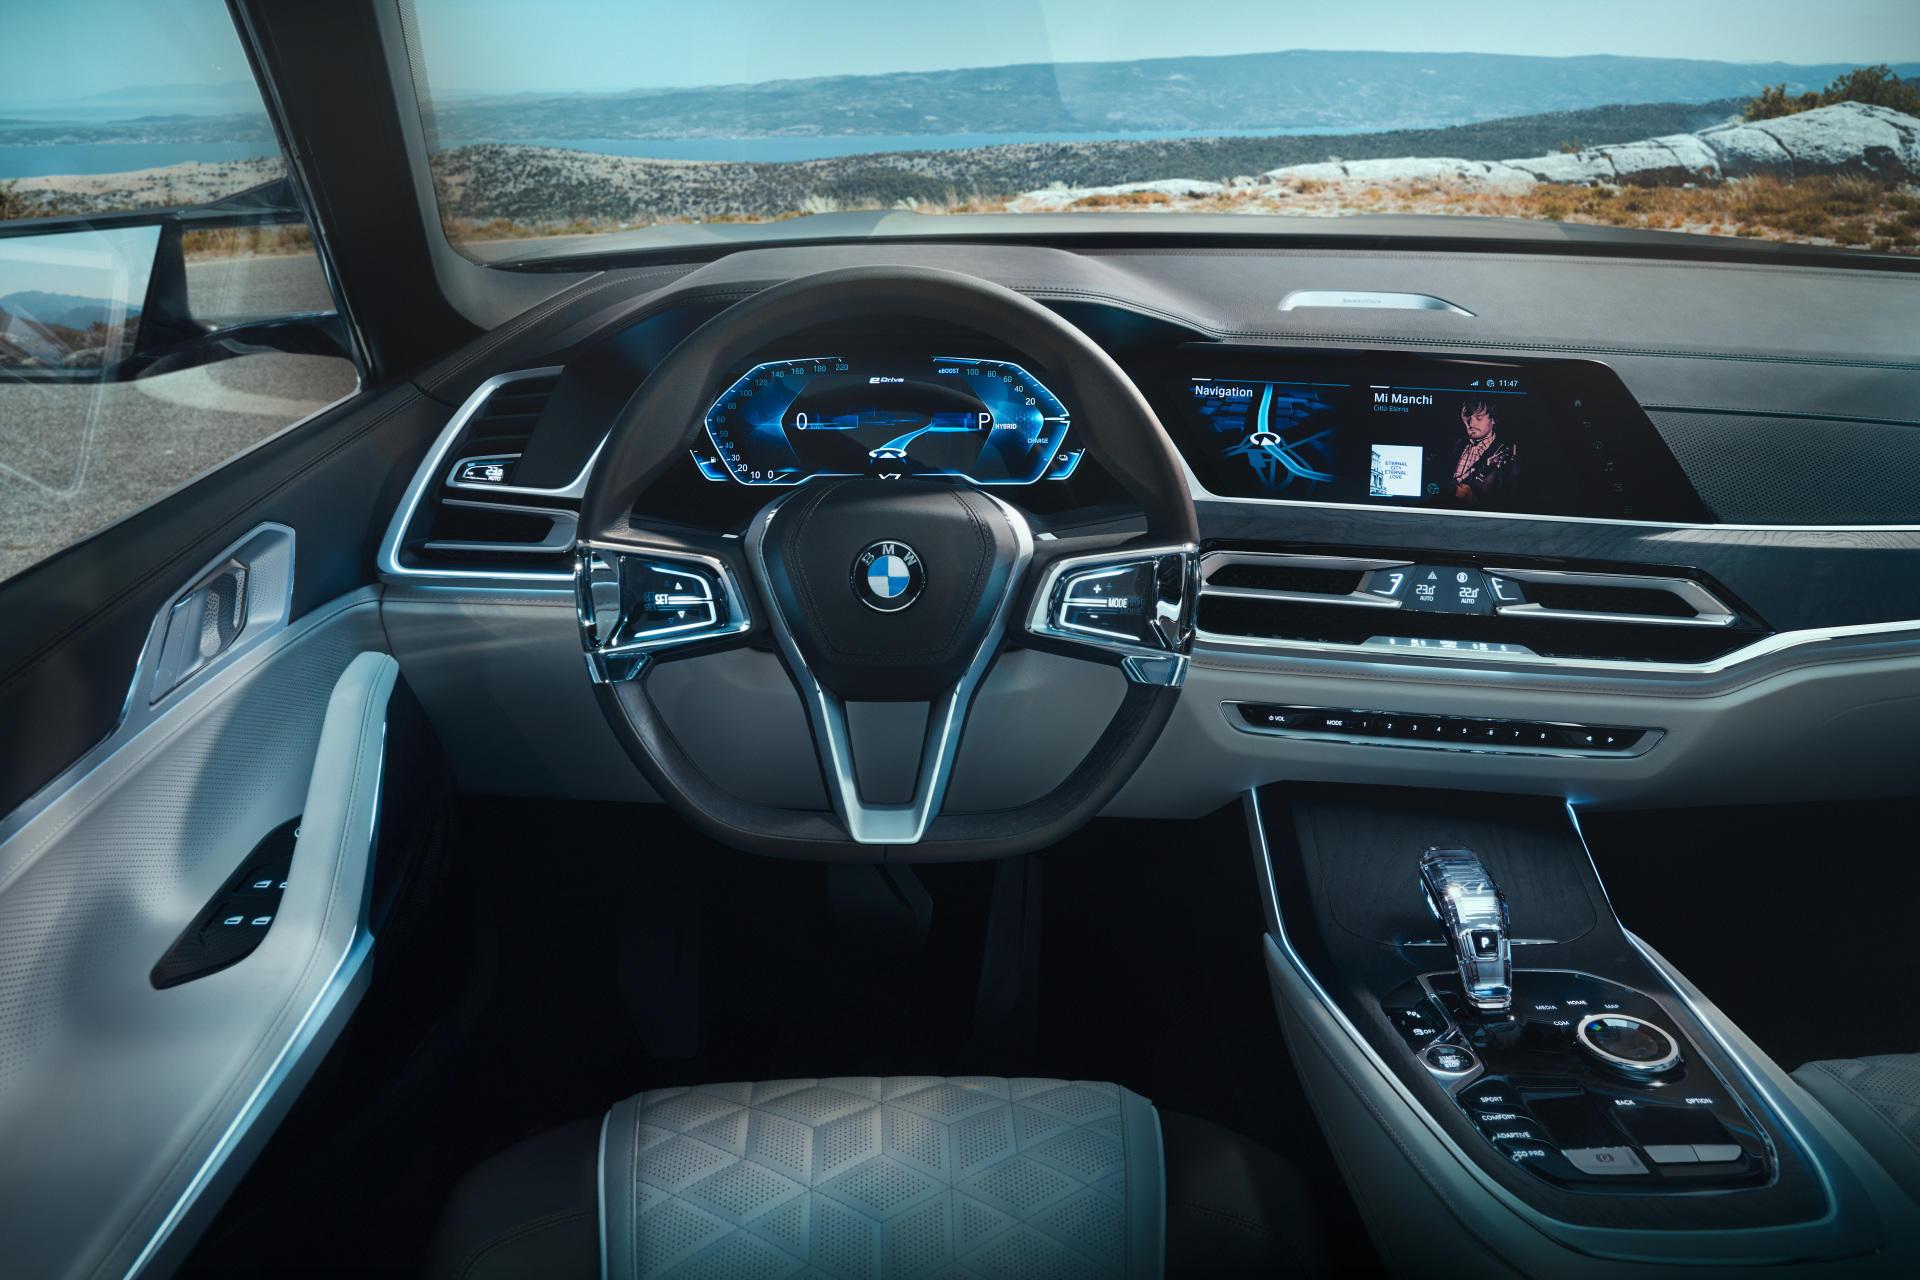 BMW-x7-concept-dm-26.jpg